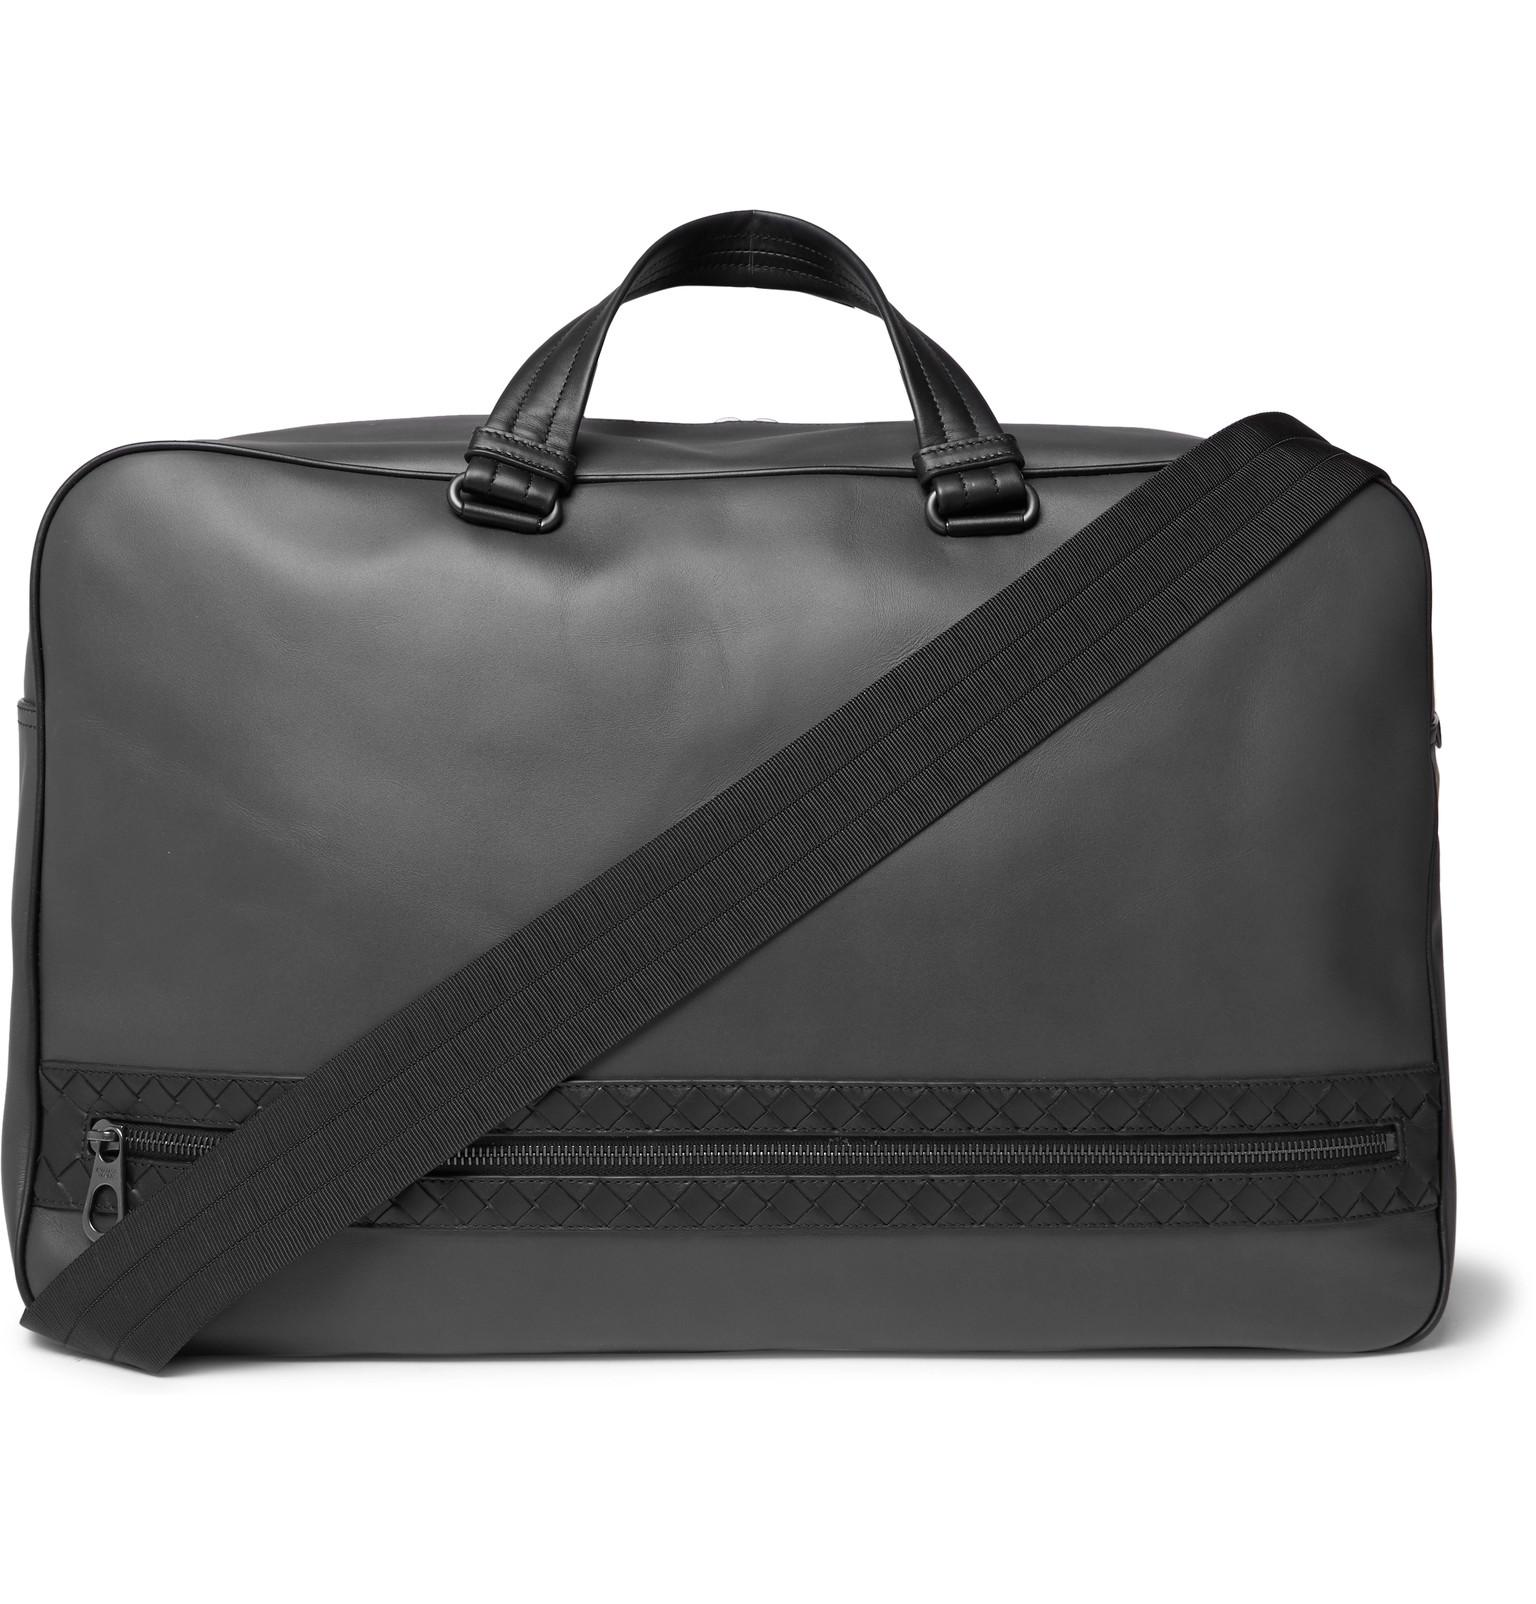 Bottega Veneta Intrecciato-trimmed Leather Holdall in Gray for Men ... 08cdec1fc4913